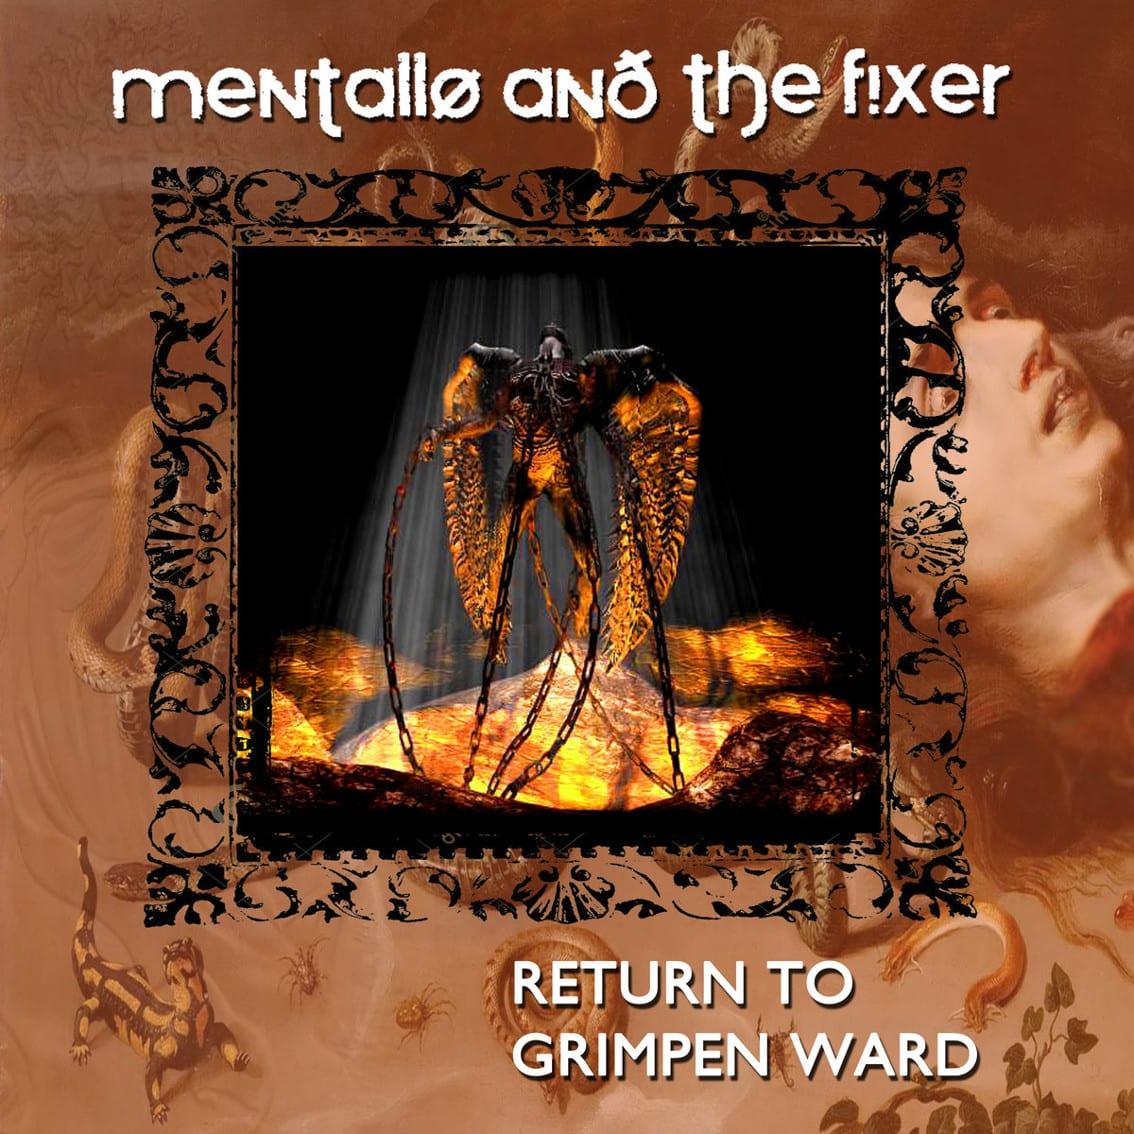 Mentallo & The Fixer launches remastered version 2001 album'Return To Grimpen Ward'